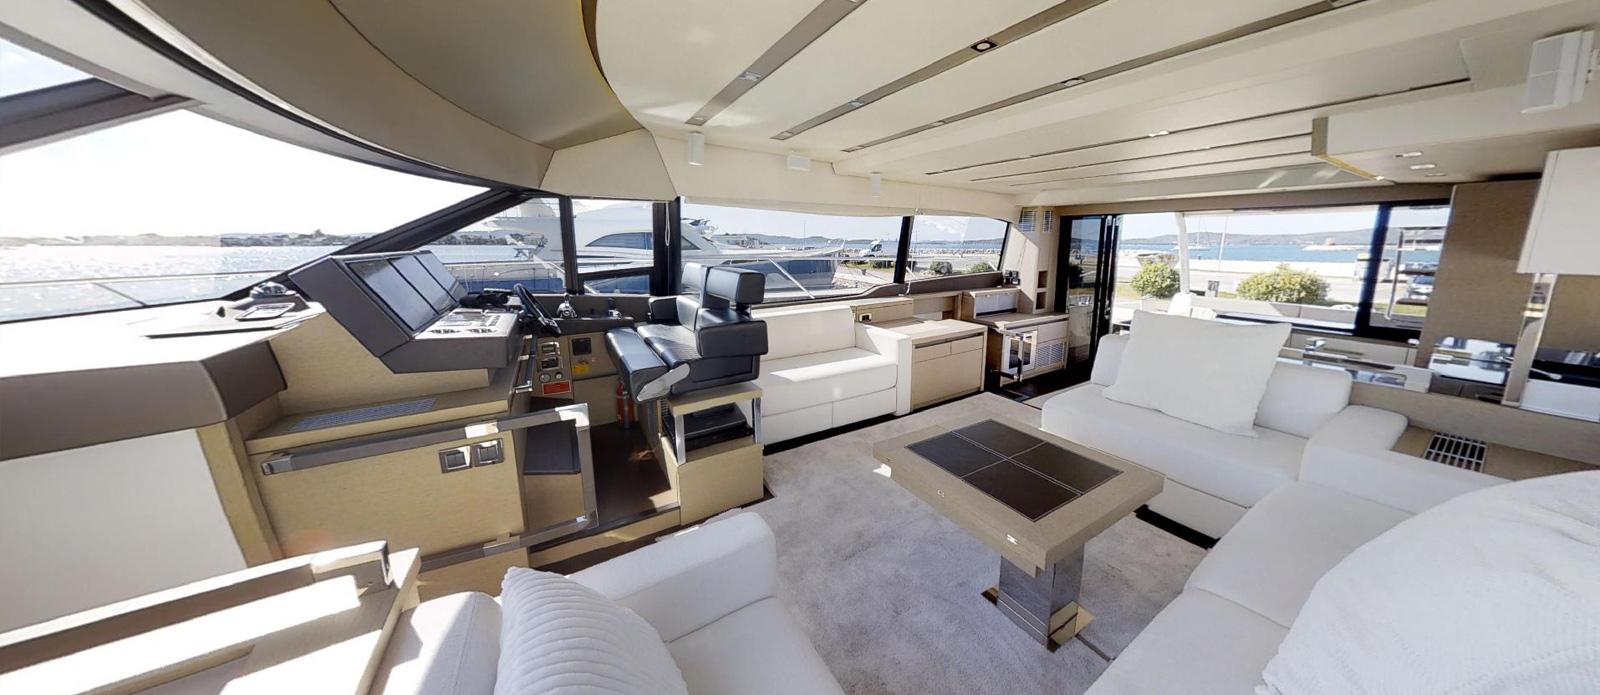 Prestige-630---Boss----Main-Deck-Saloon-2